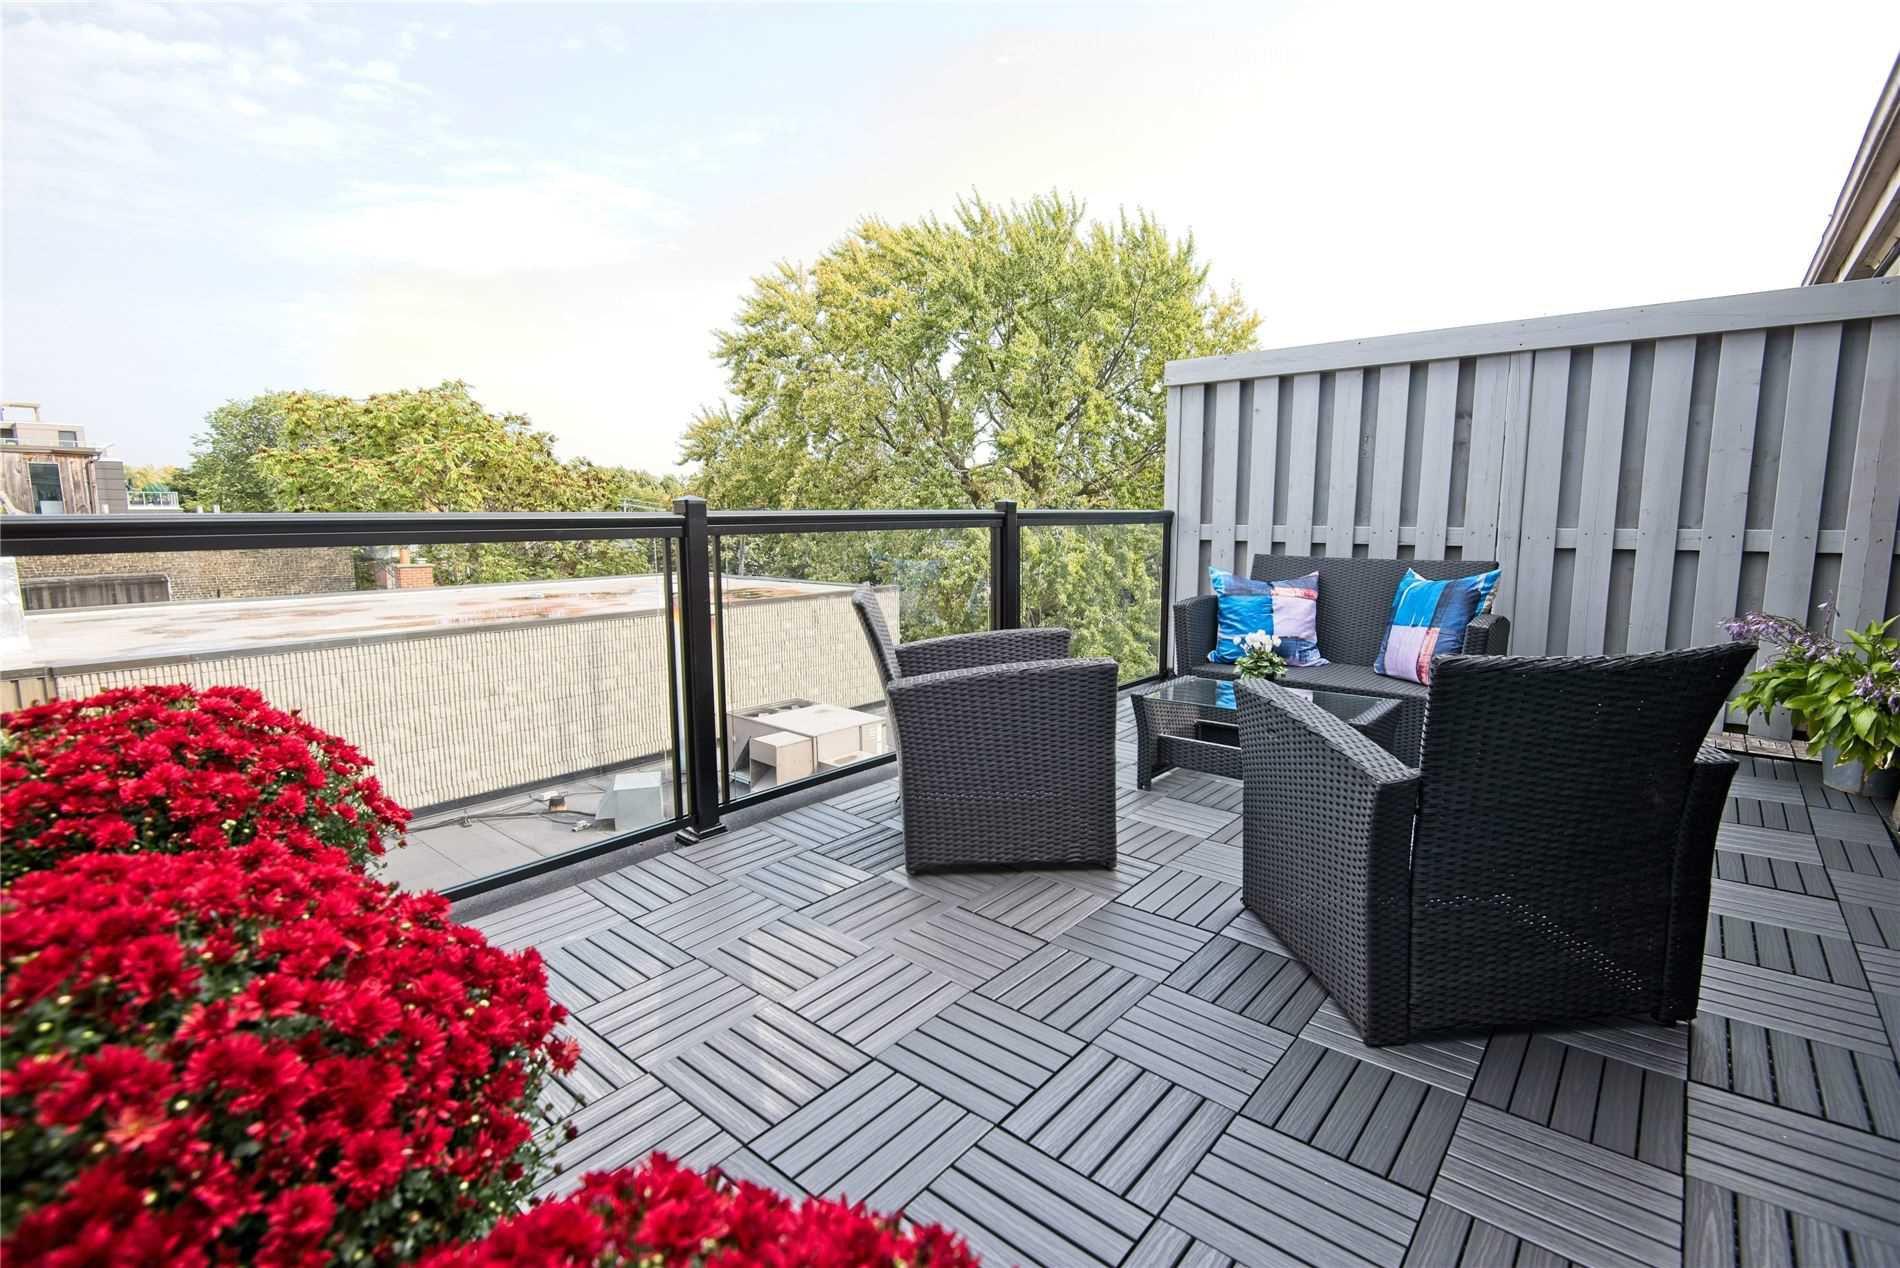 Photo 23: Photos: 213 Heward Avenue in Toronto: South Riverdale House (3-Storey) for sale (Toronto E01)  : MLS®# E4941877